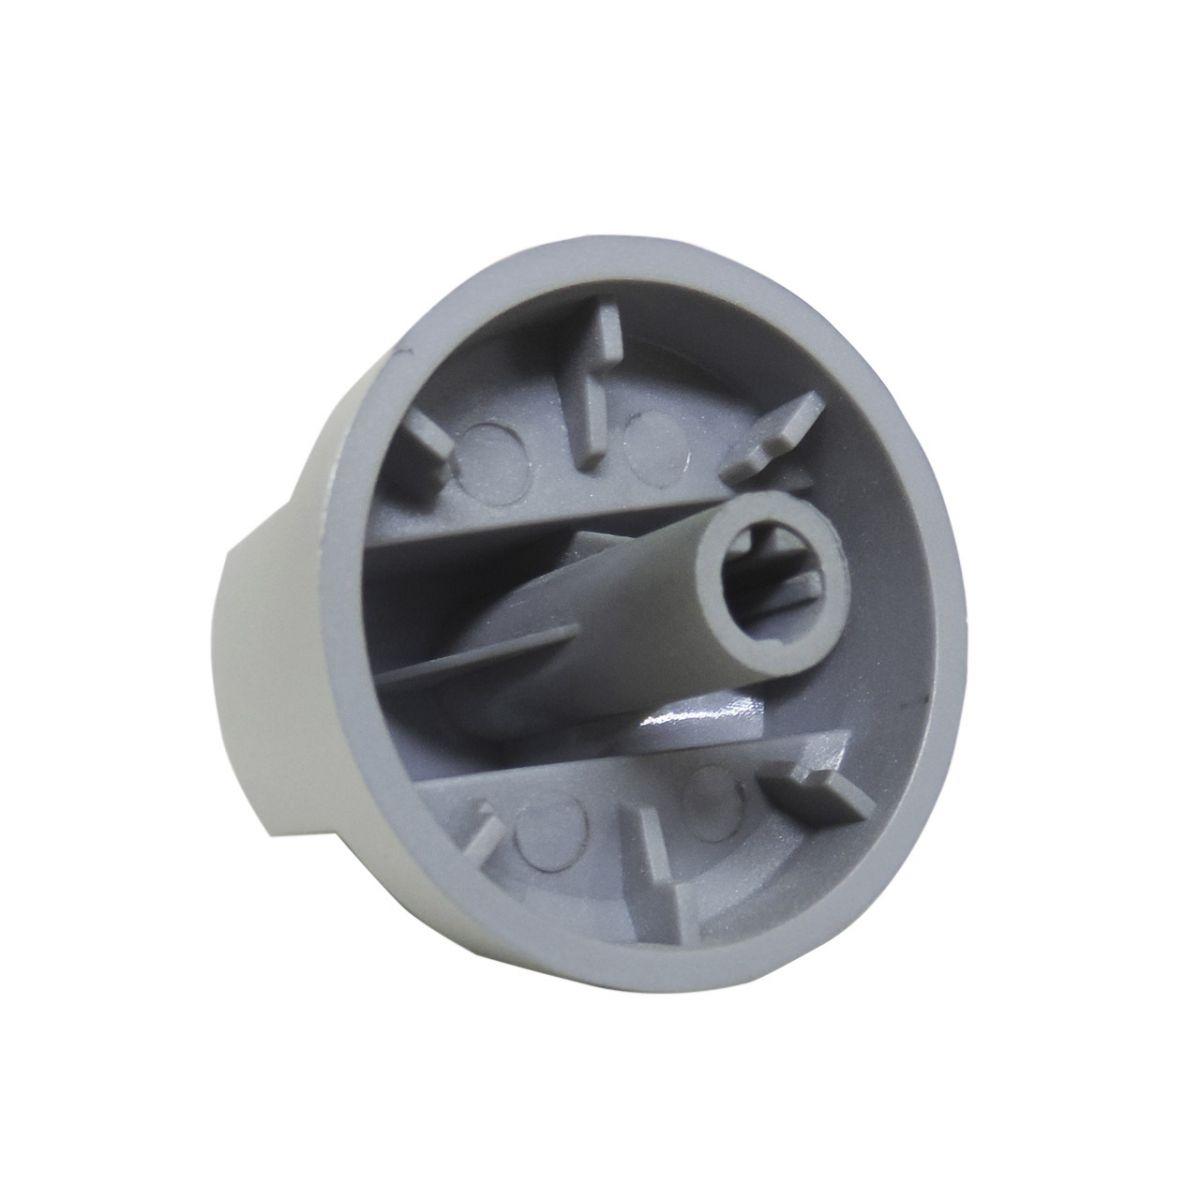 Botão Inox Forno Elétrico Electrolux Fb54X